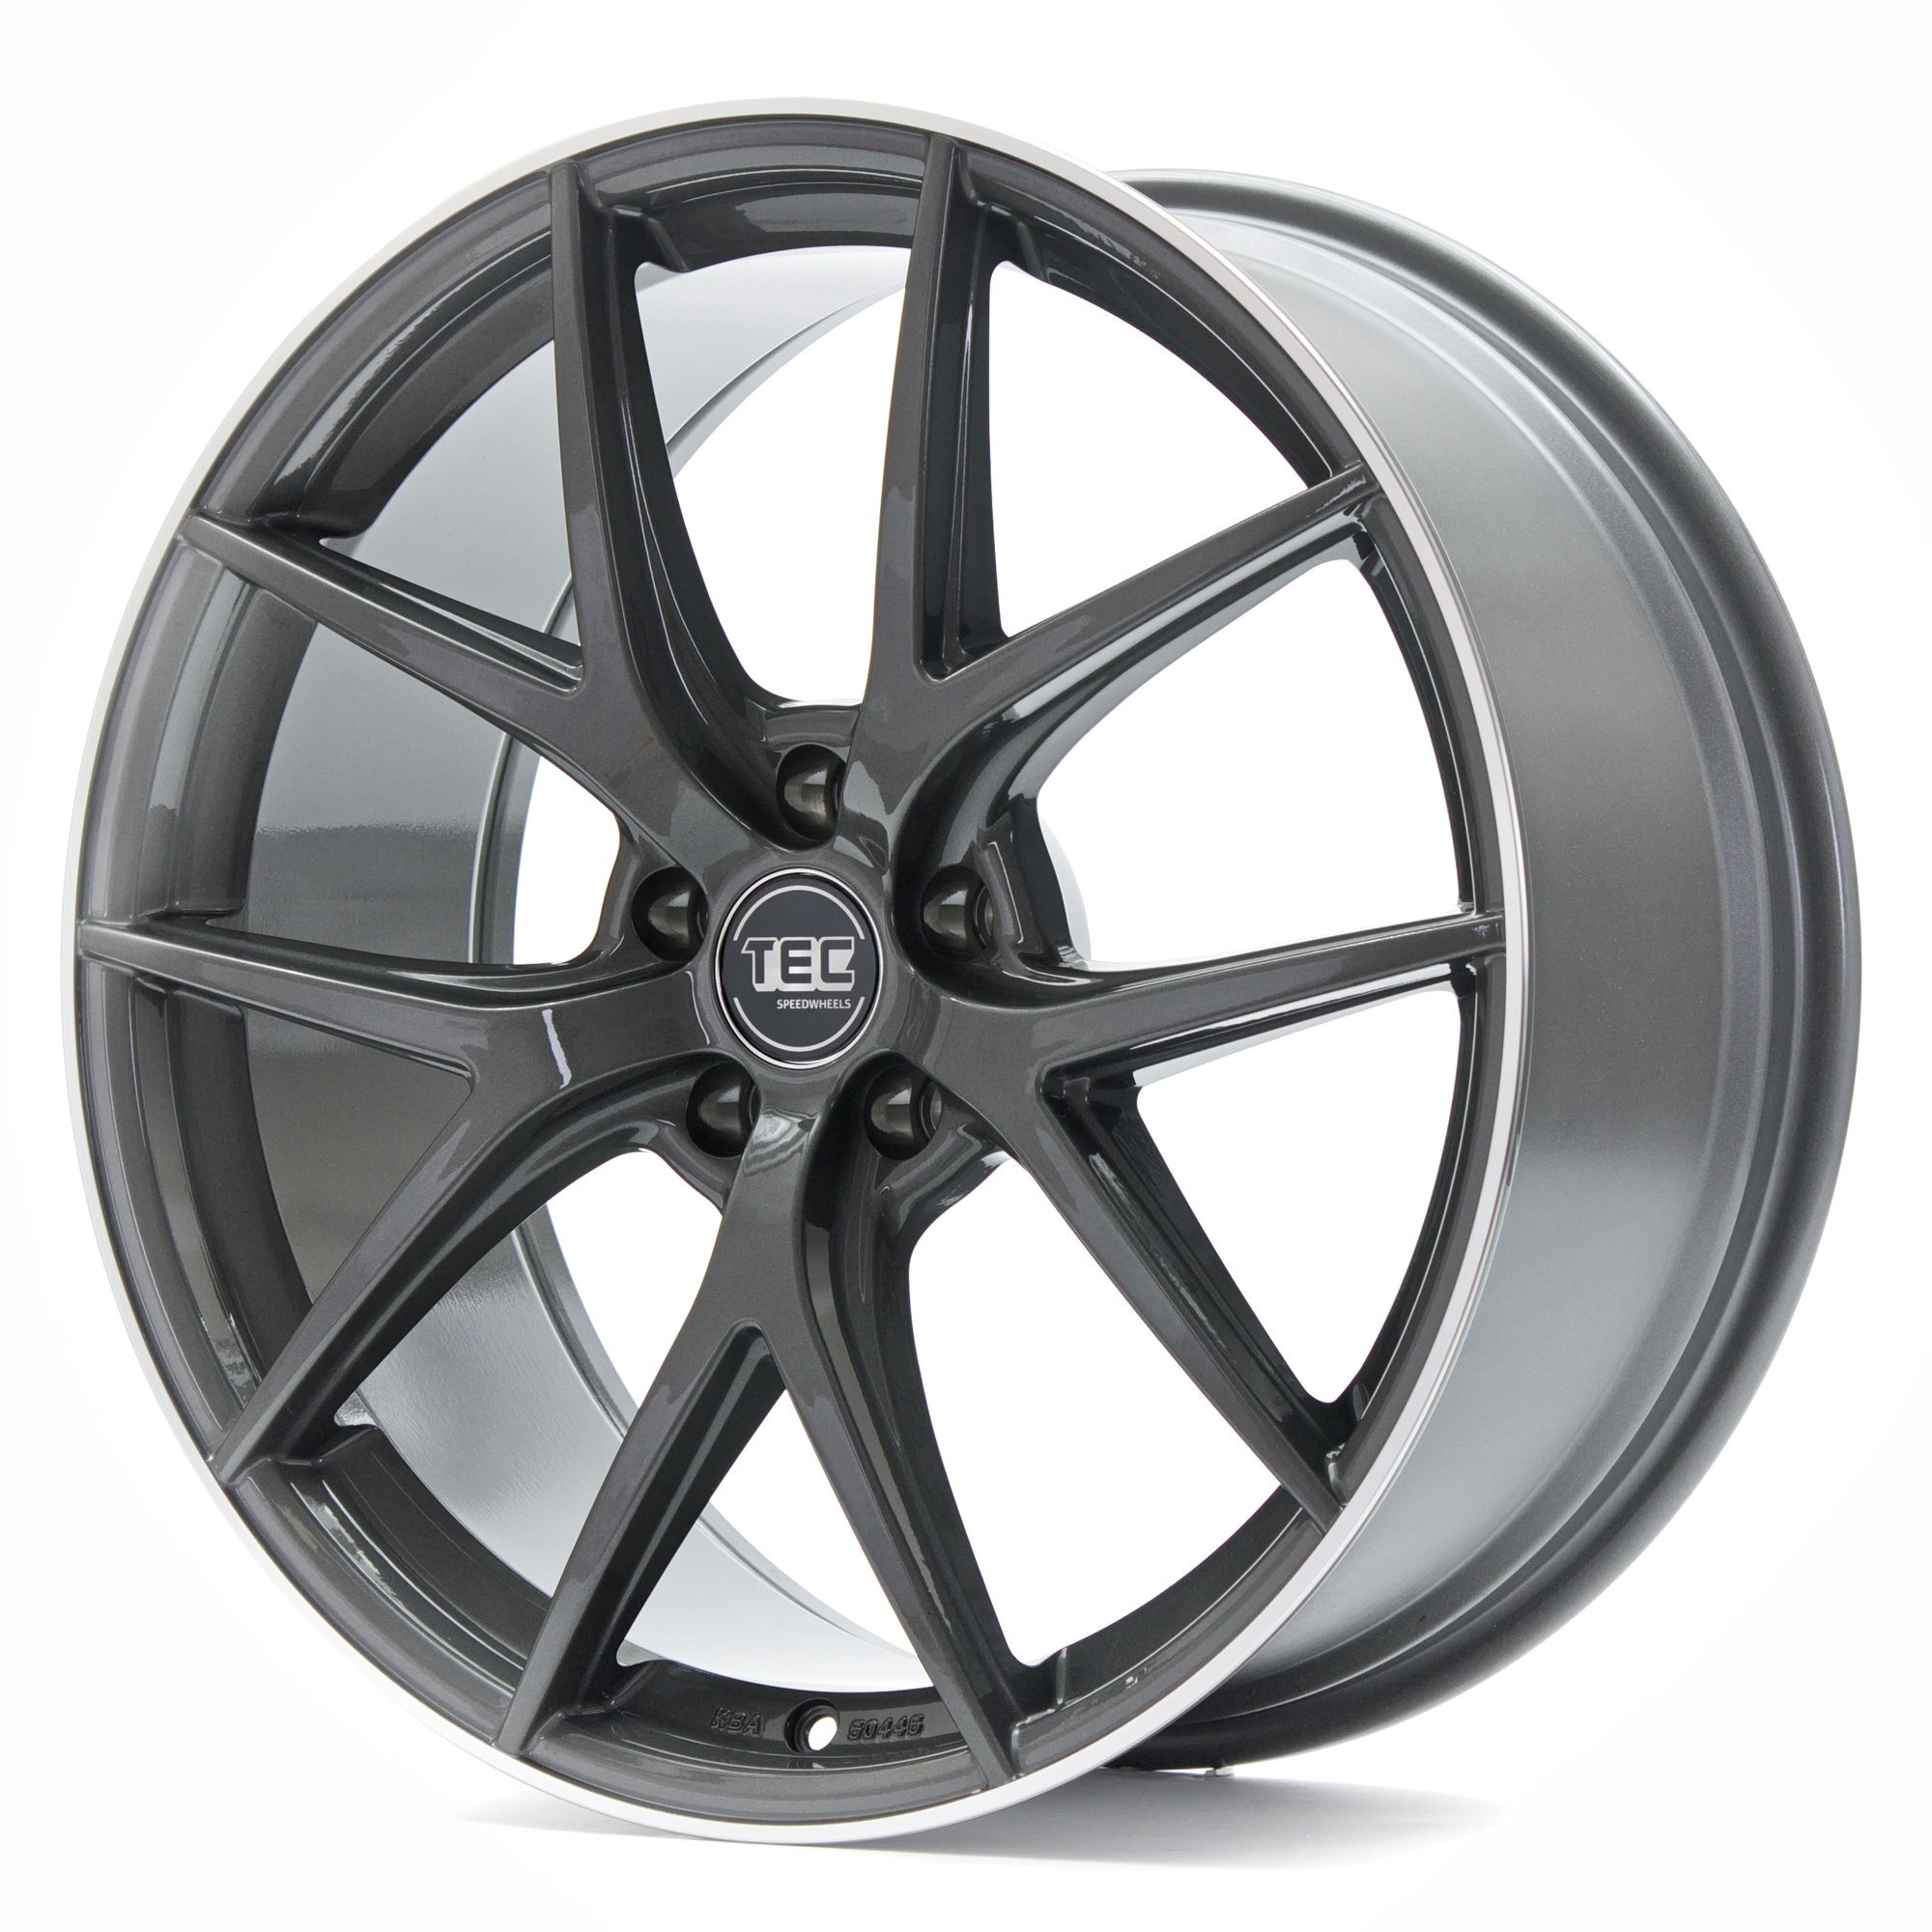 tec speedwheels gt6 felgen dark grey polished lip grau silber in 19 zoll. Black Bedroom Furniture Sets. Home Design Ideas